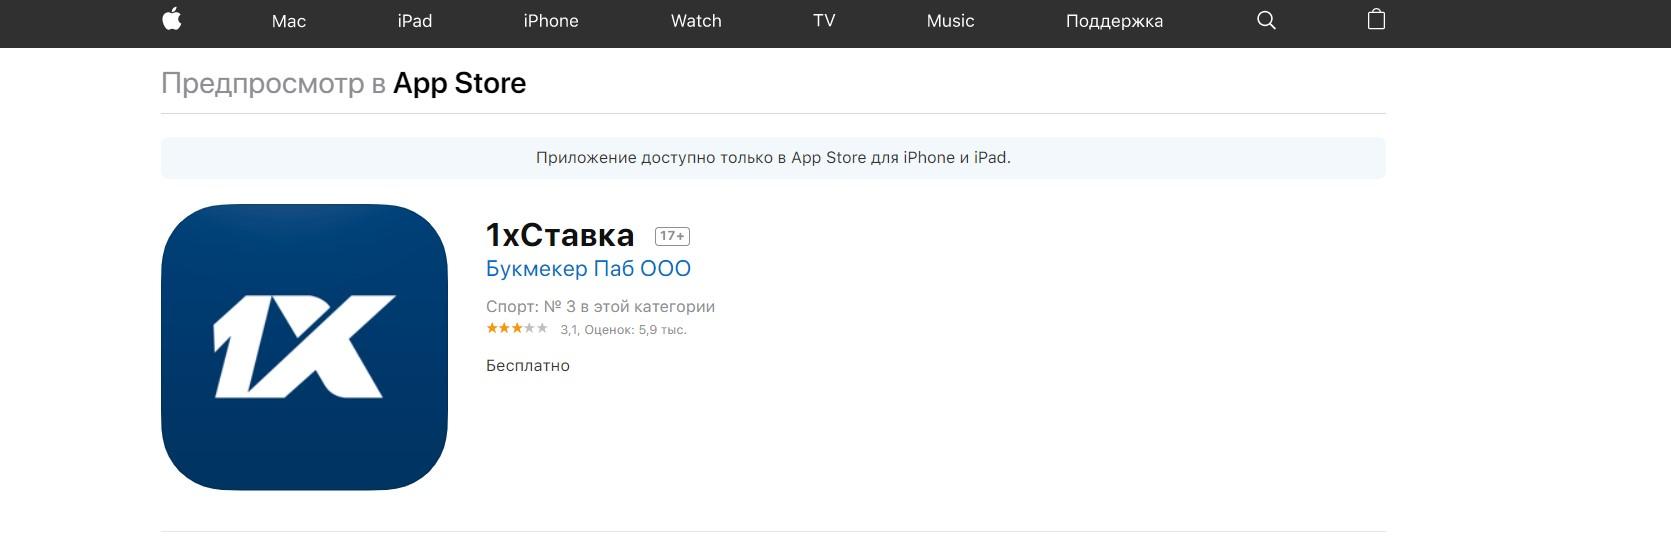 1xStavka App Store